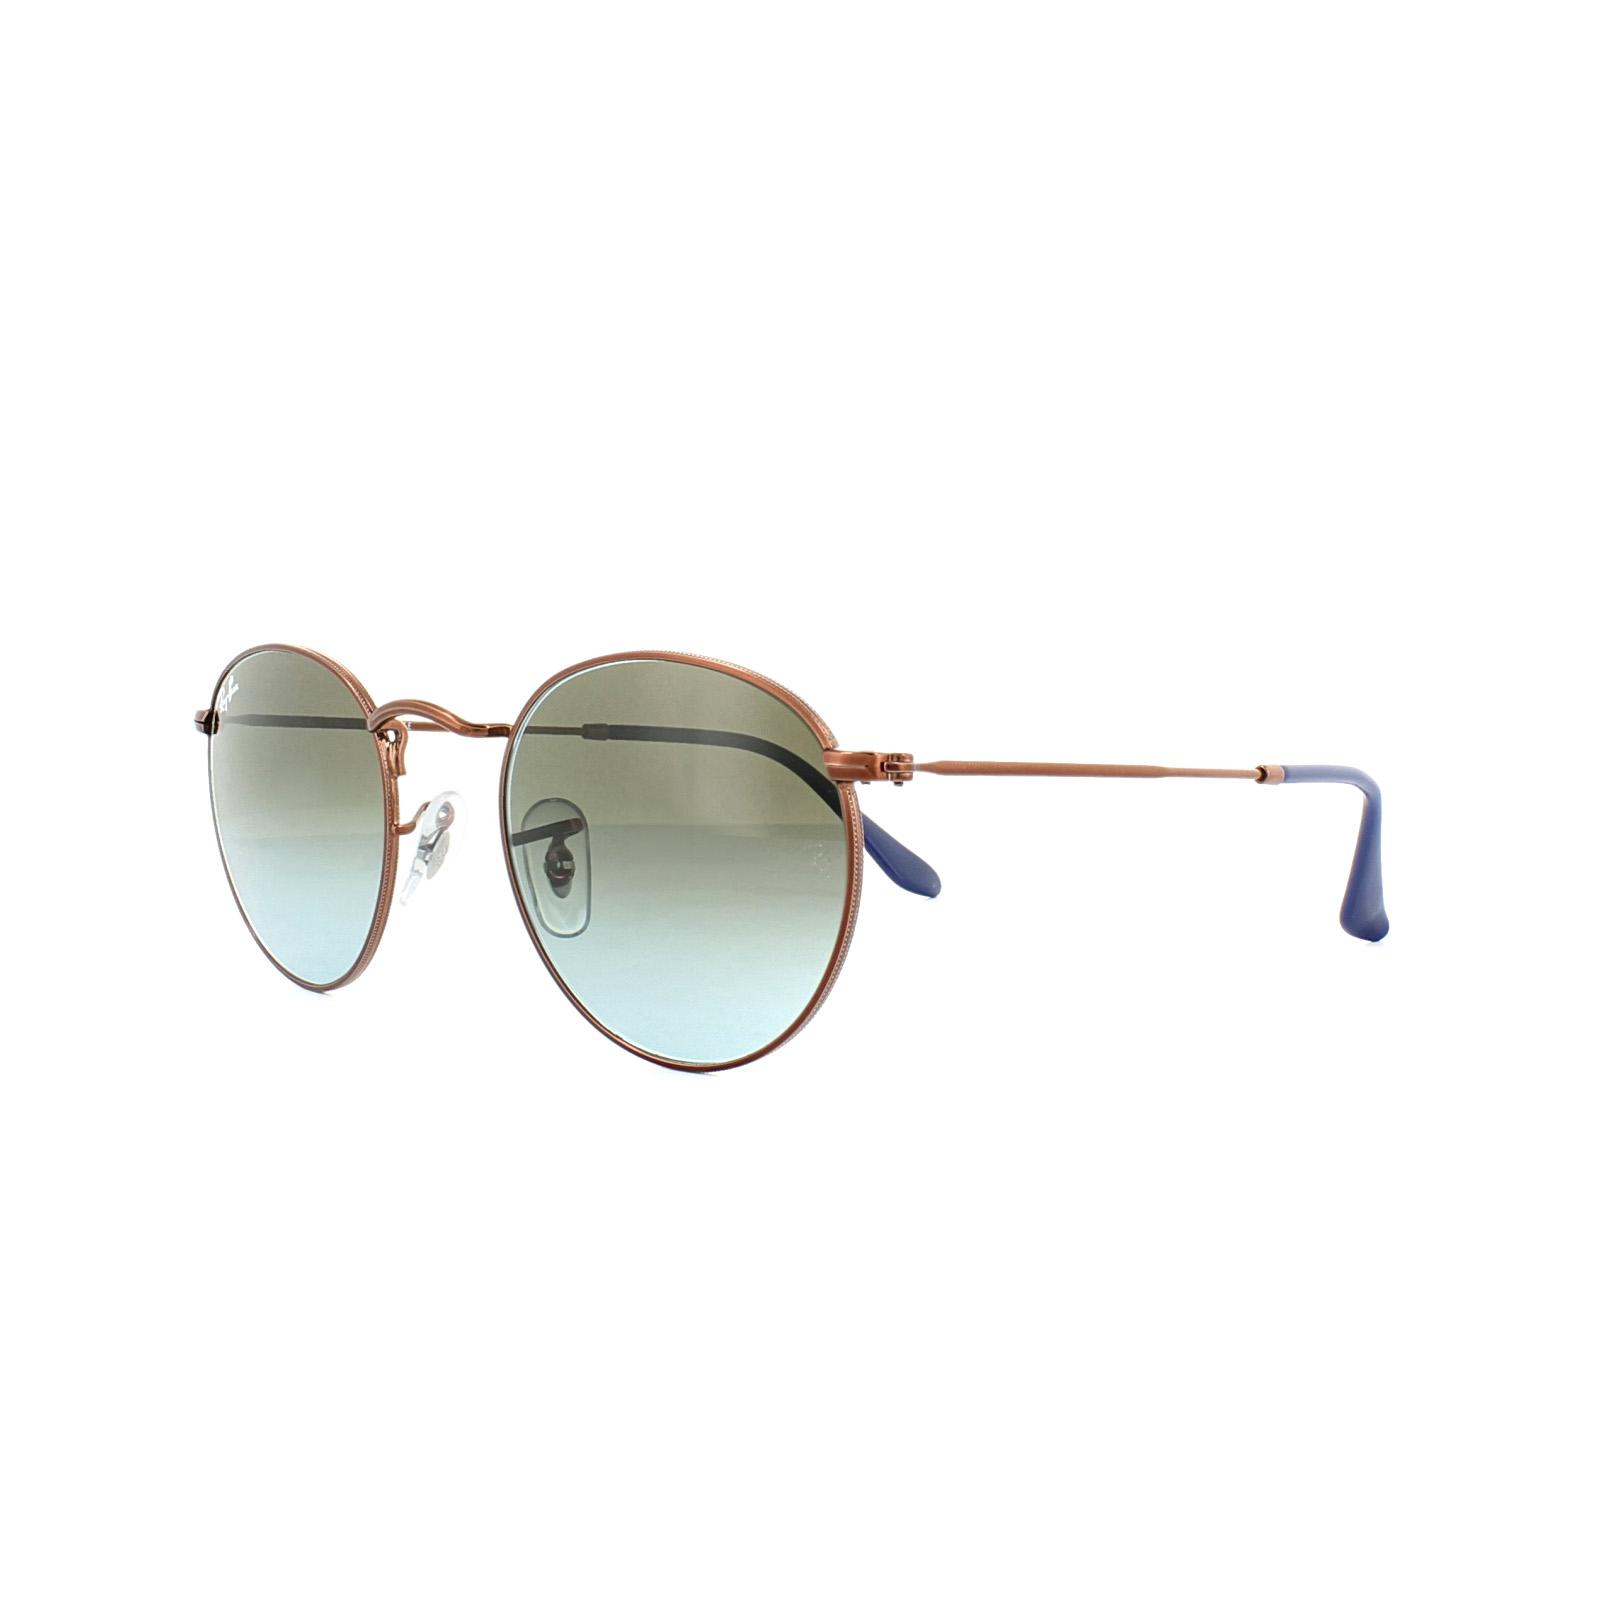 671486c07465 Sentinel Ray-Ban Sunglasses Round Metal 3447 900396 Bronze Copper Blue  Brown Gradient 53m